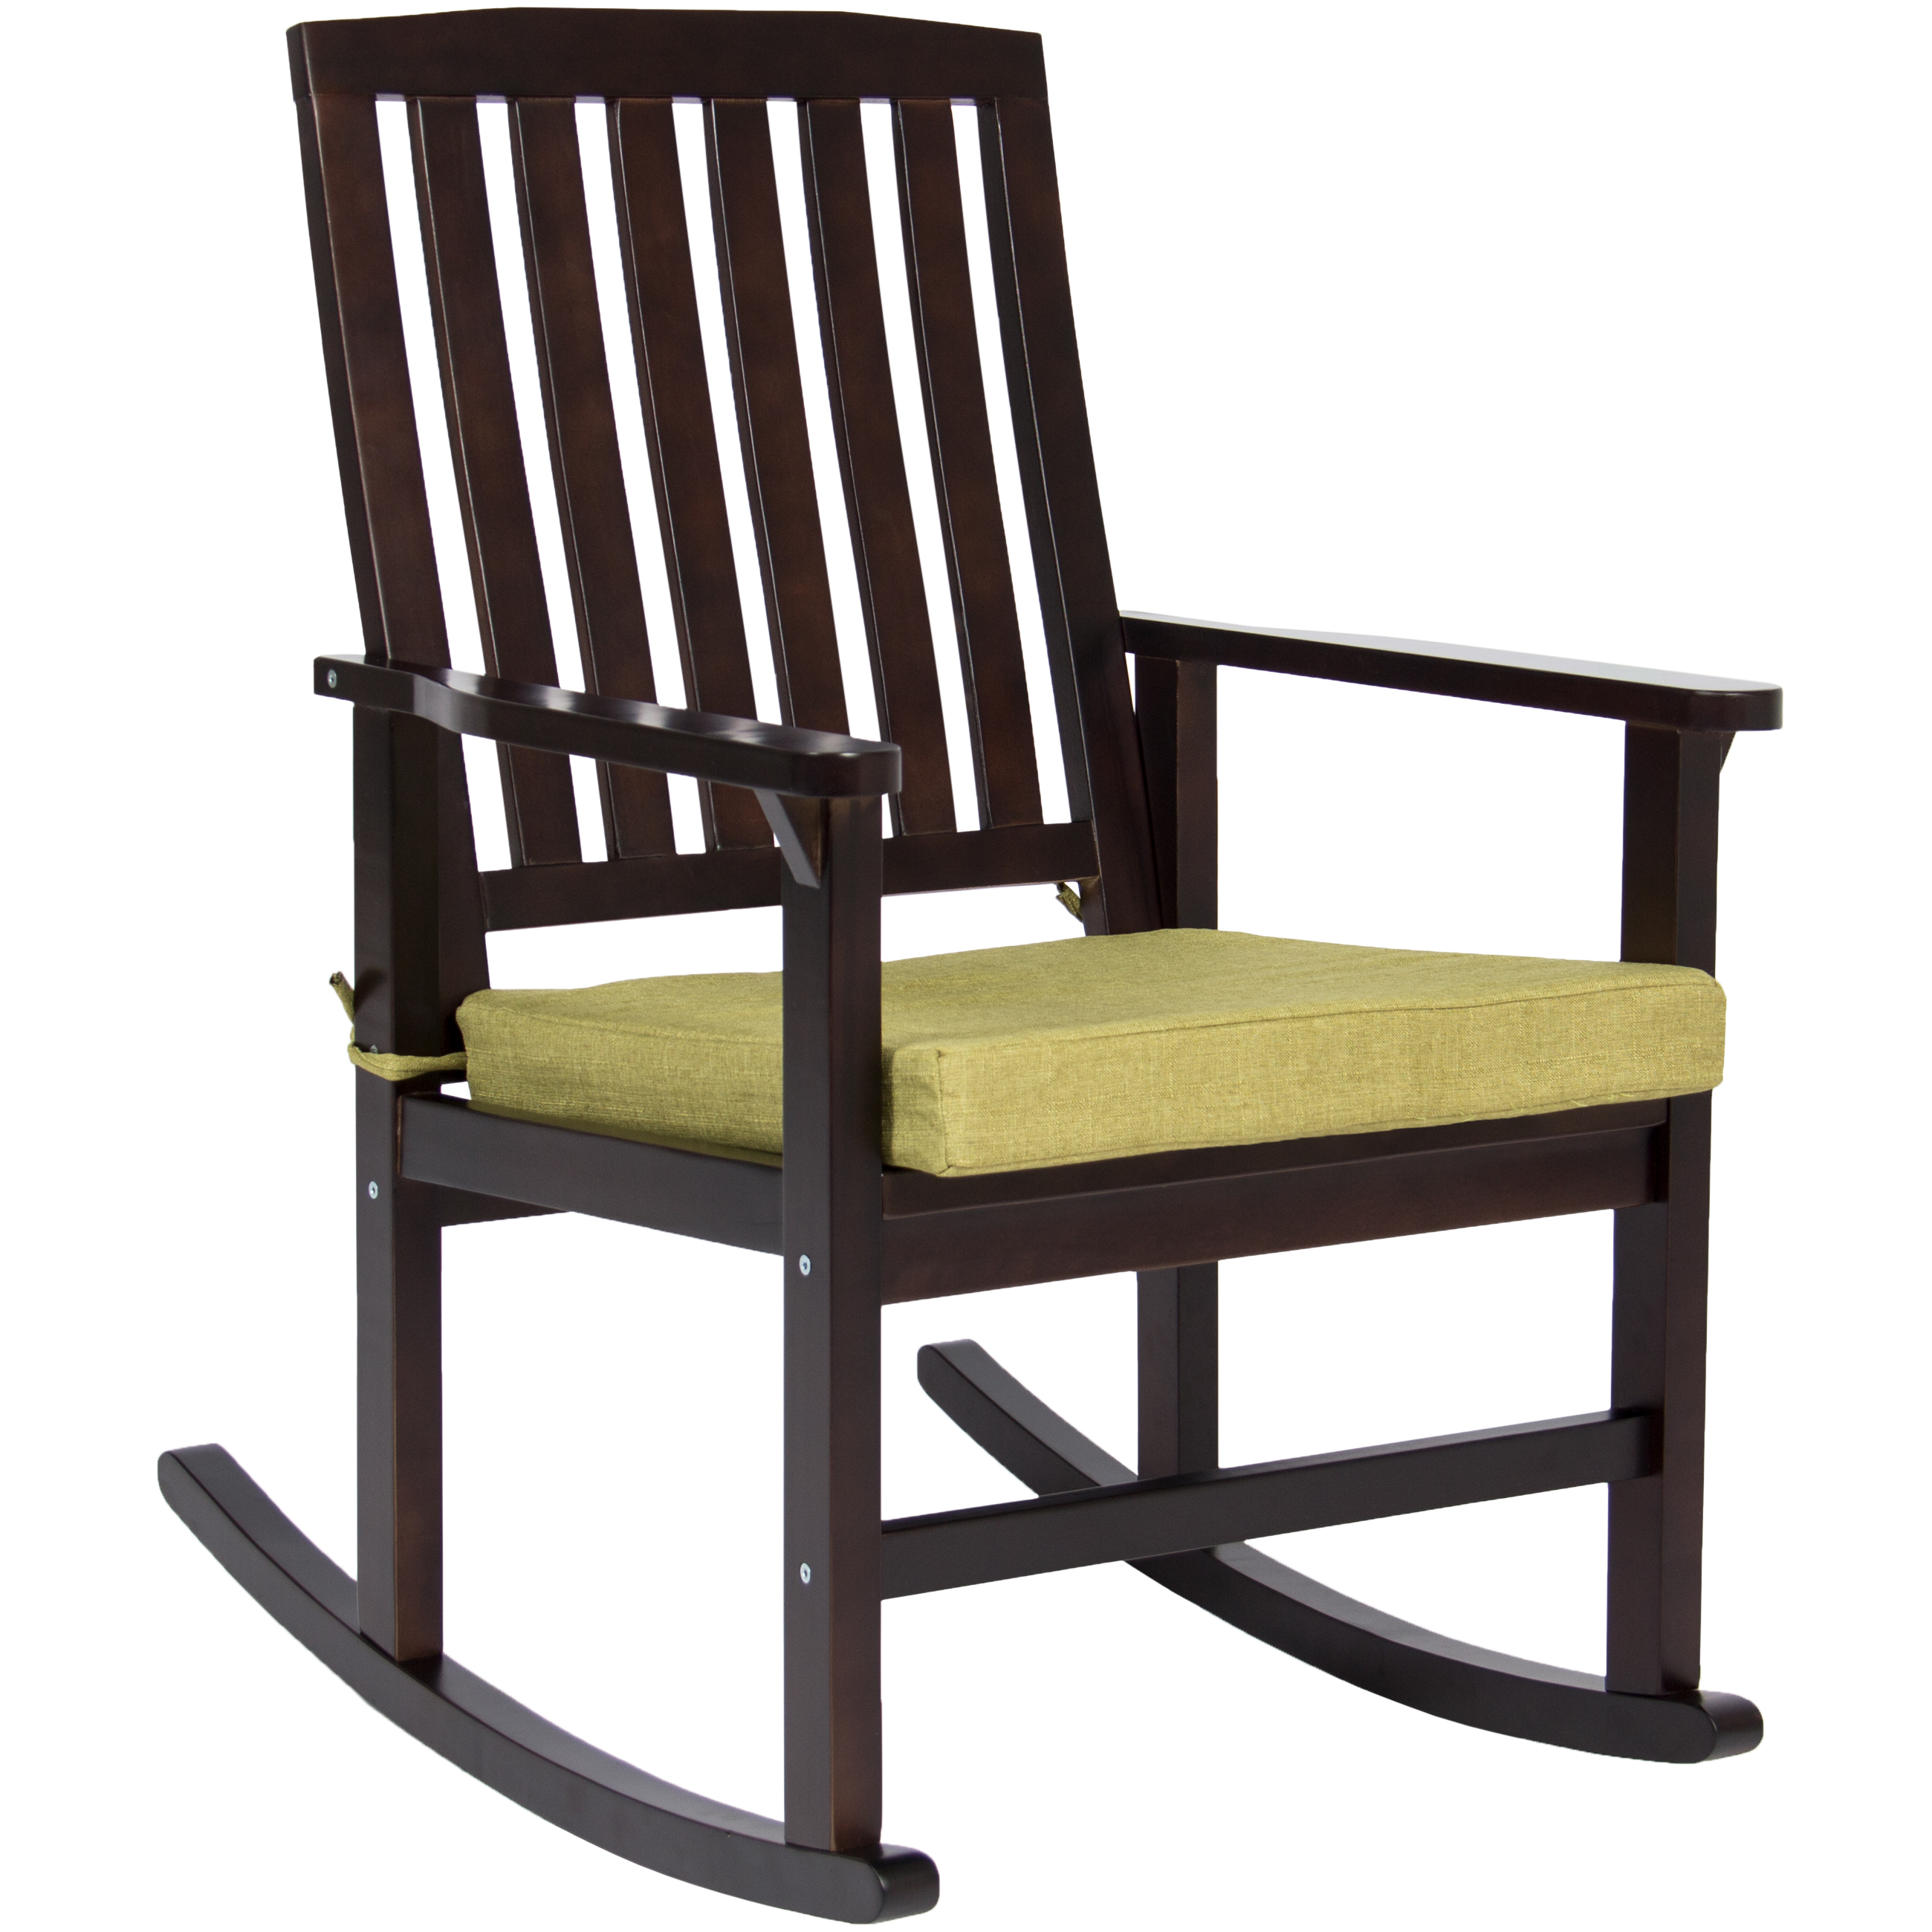 Etonnant Best Choice Products Indoor Outdoor Home Furniture Wooden Patio Rocking  Chair Porch Rocker Set Glider Furniture W/ Seat Cushion   Brown/Green    Walmart.com